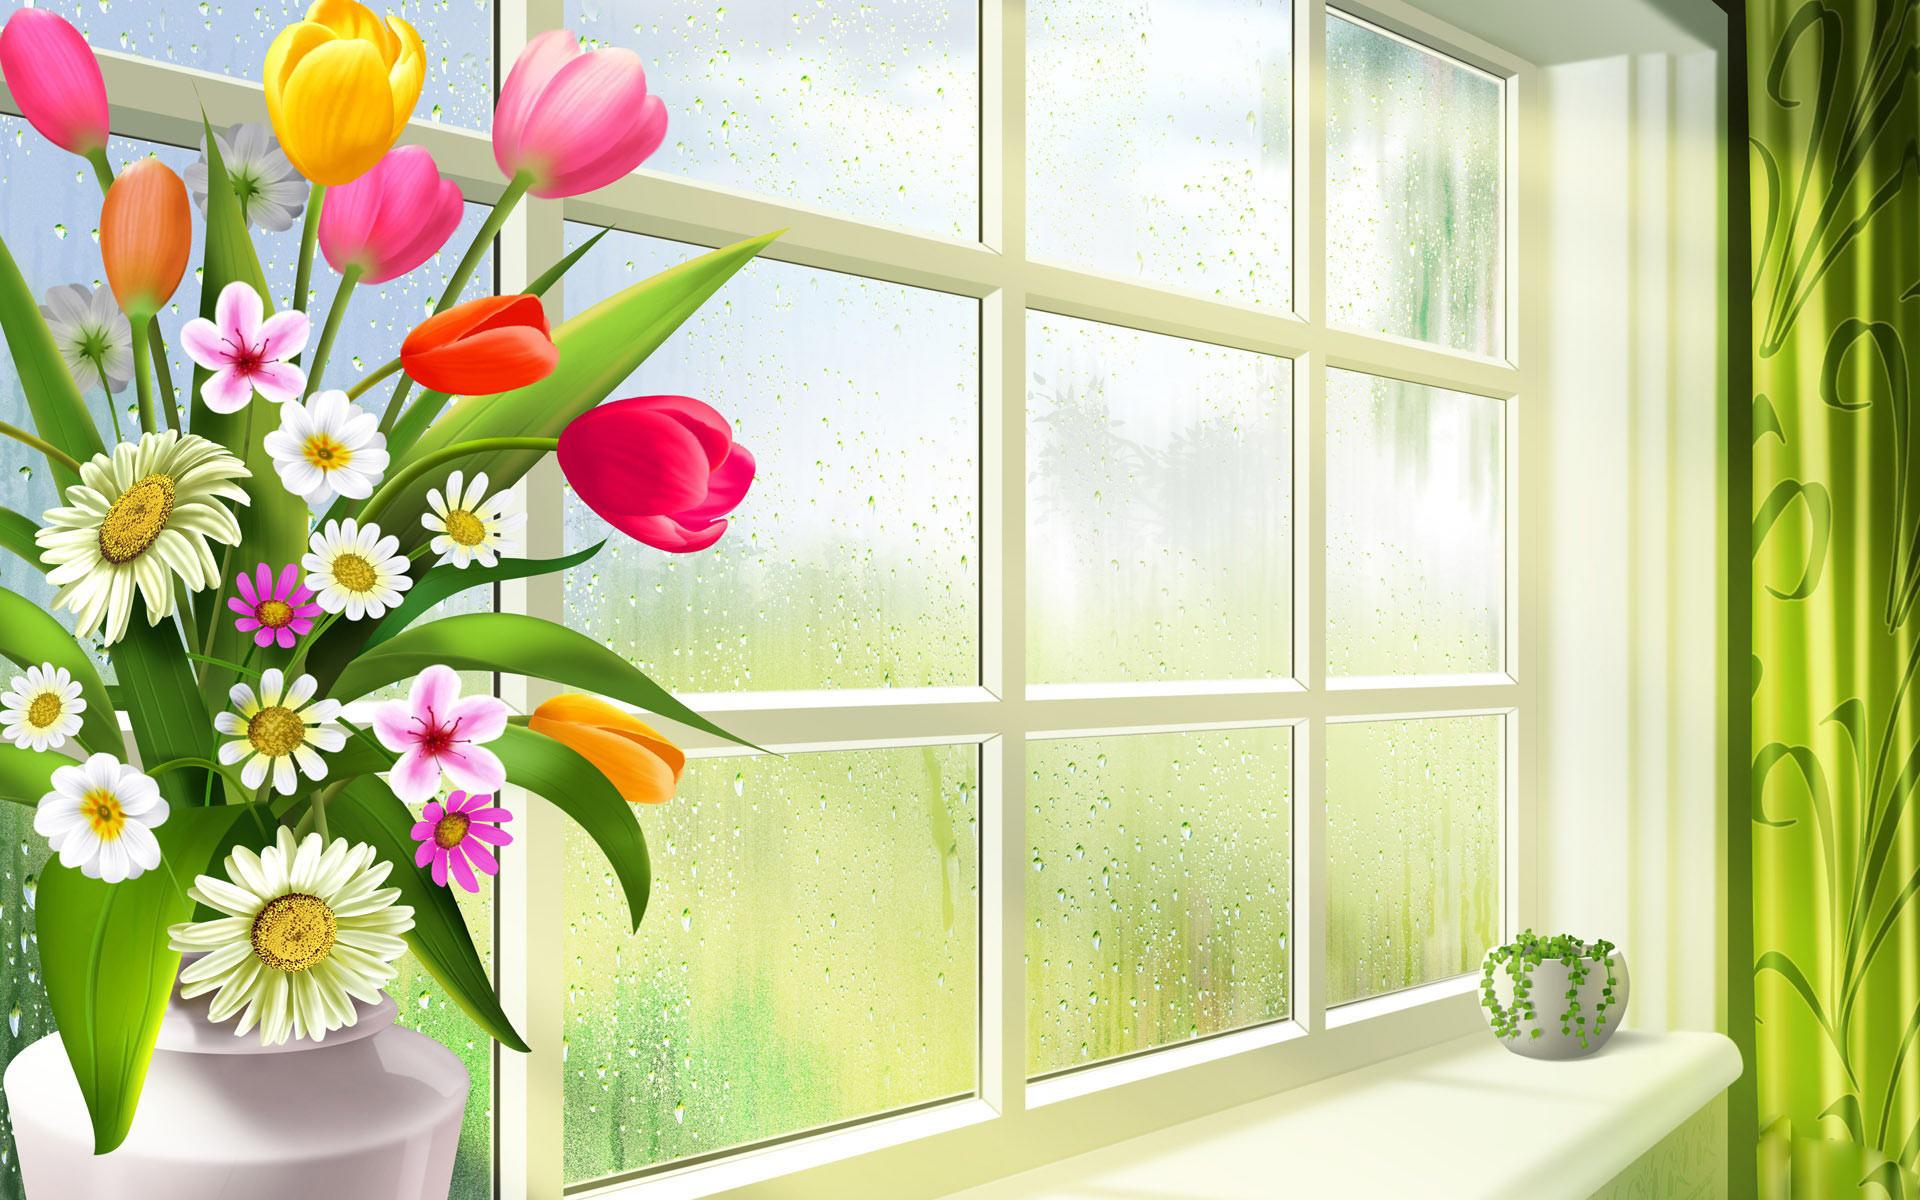 Pretty Spring Desktop Backgrounds, wallpaper, Pretty Spring Desktop .